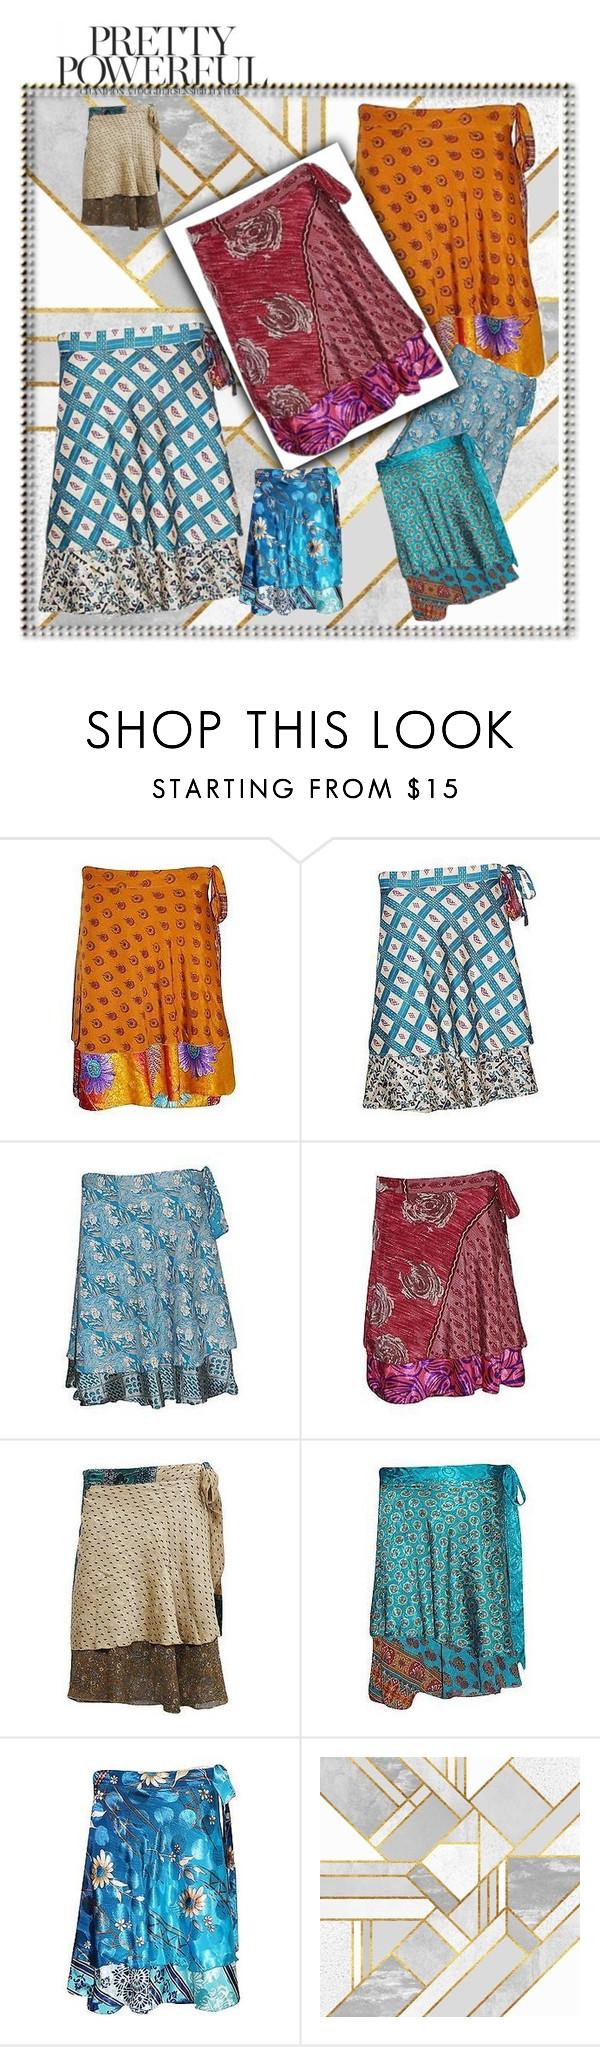 Boho short wrap skirts by baydeals on Polyvore  http://stores.ebay.com/mogulgallery/Silk-Sari-Skirts-/_i.html?_fsub=761673819&_sid=3781319&_trksid=p4634.c0.m322